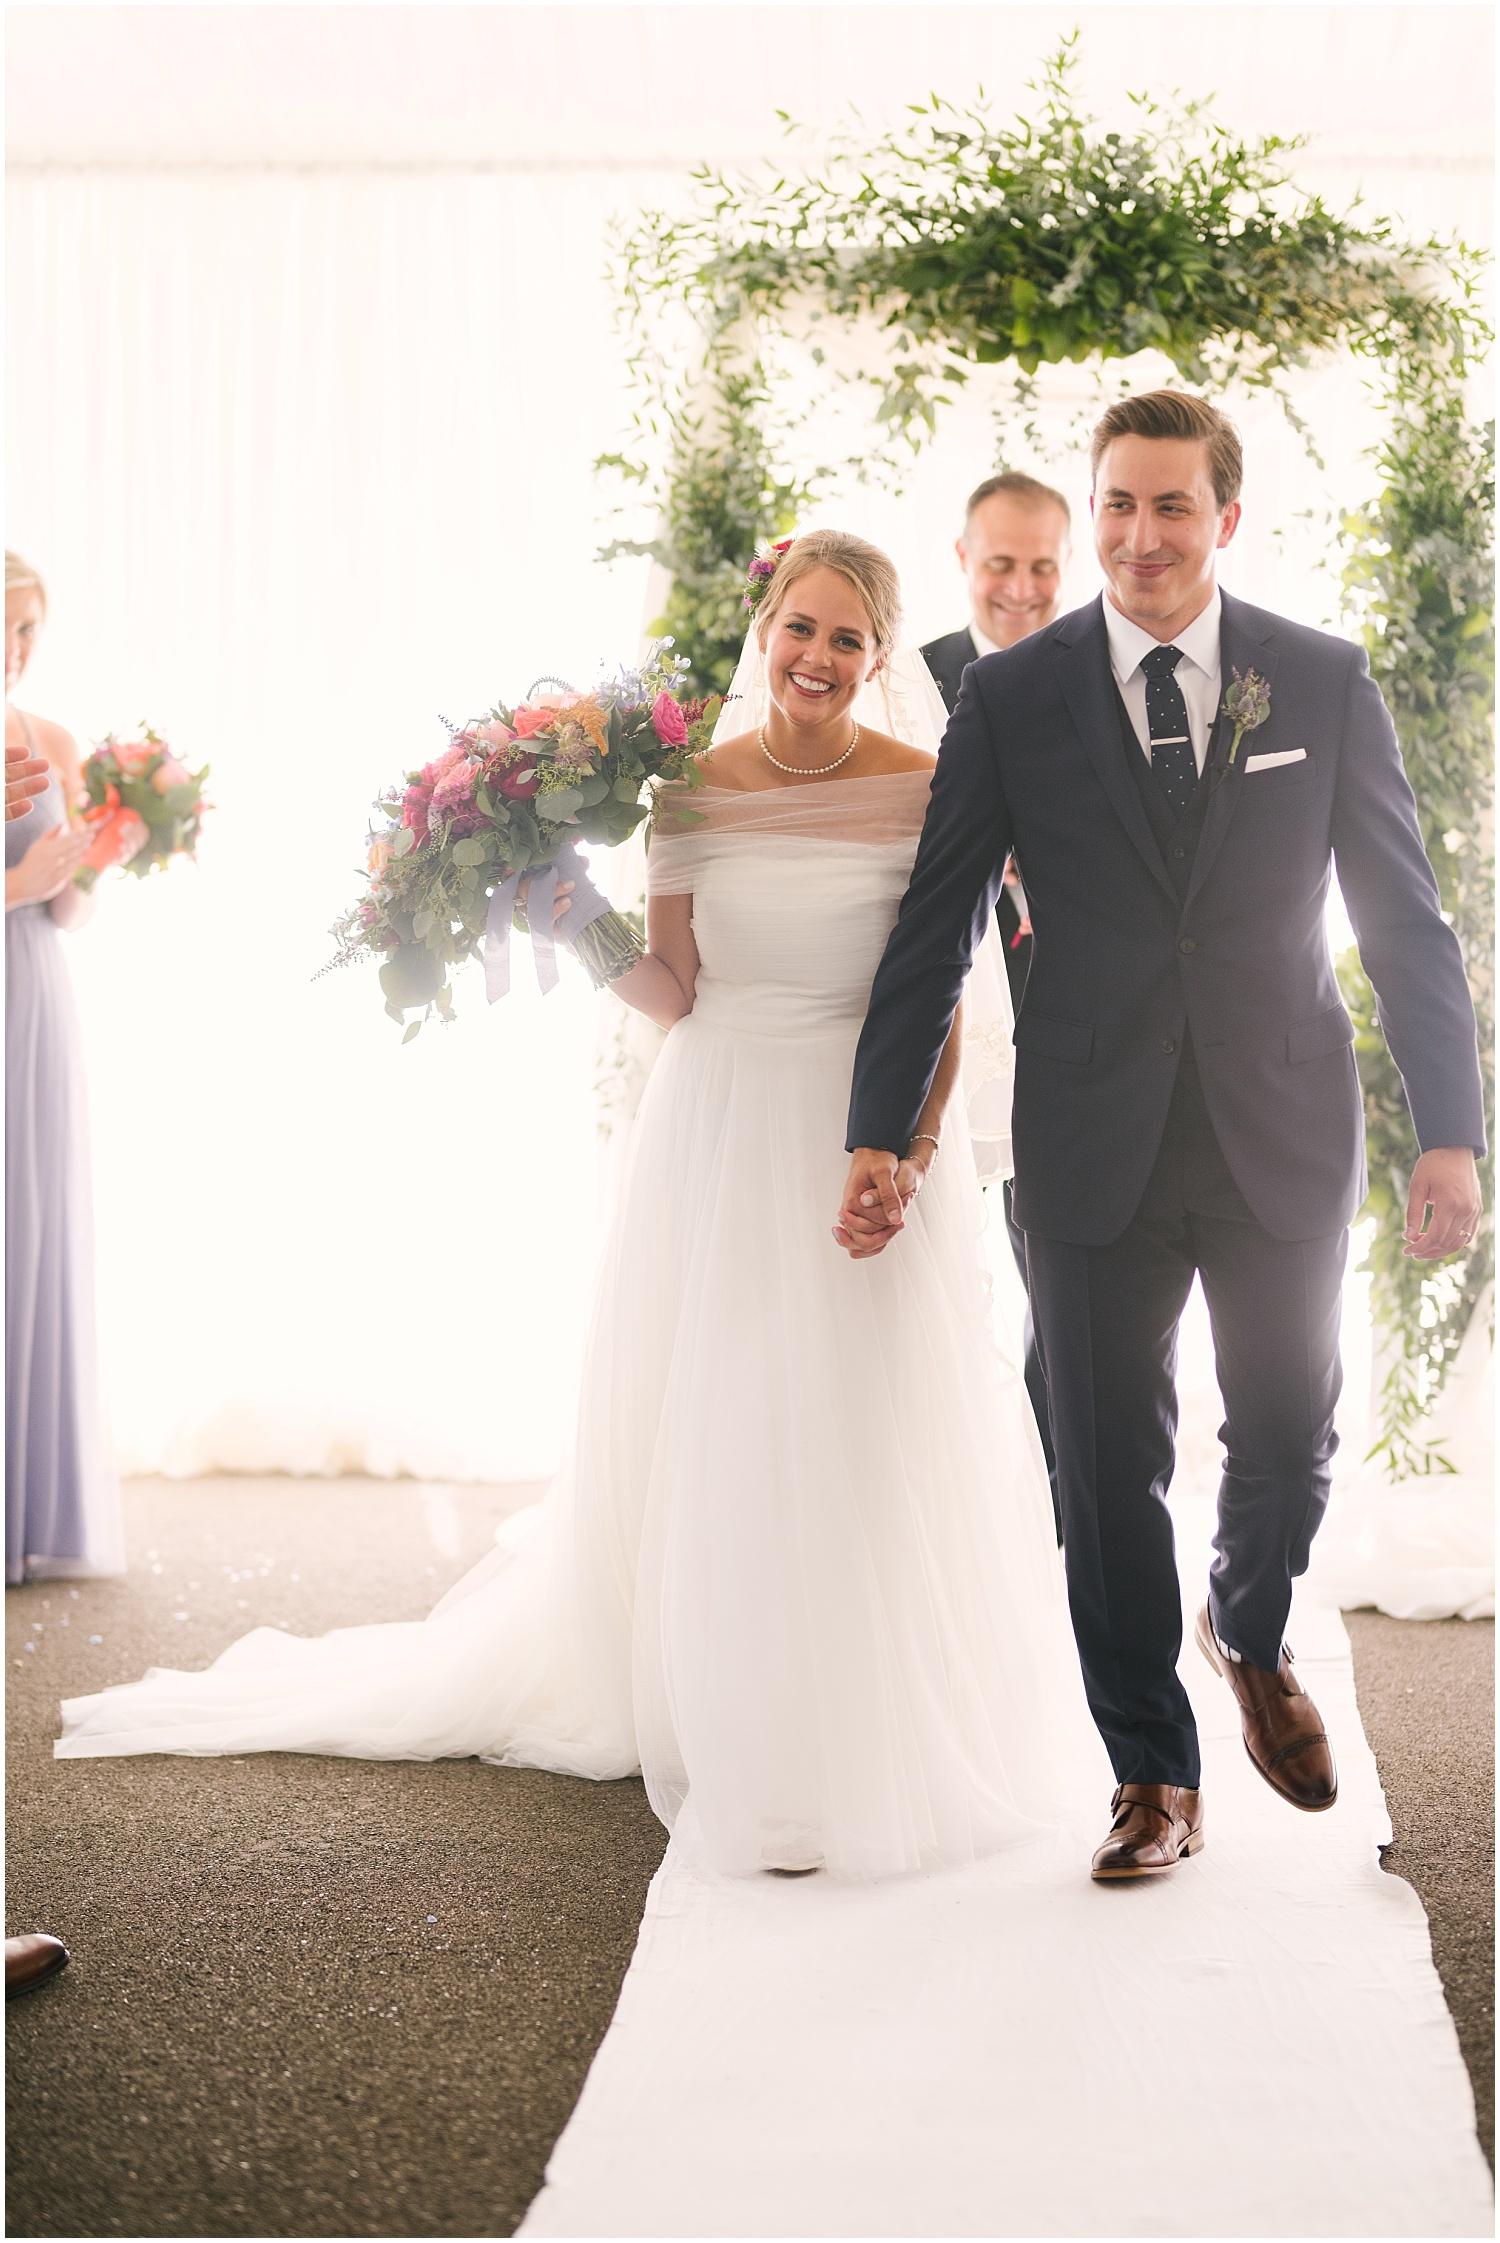 traditions+at+the+glen+wedding+binghamton+wedding (58).jpg